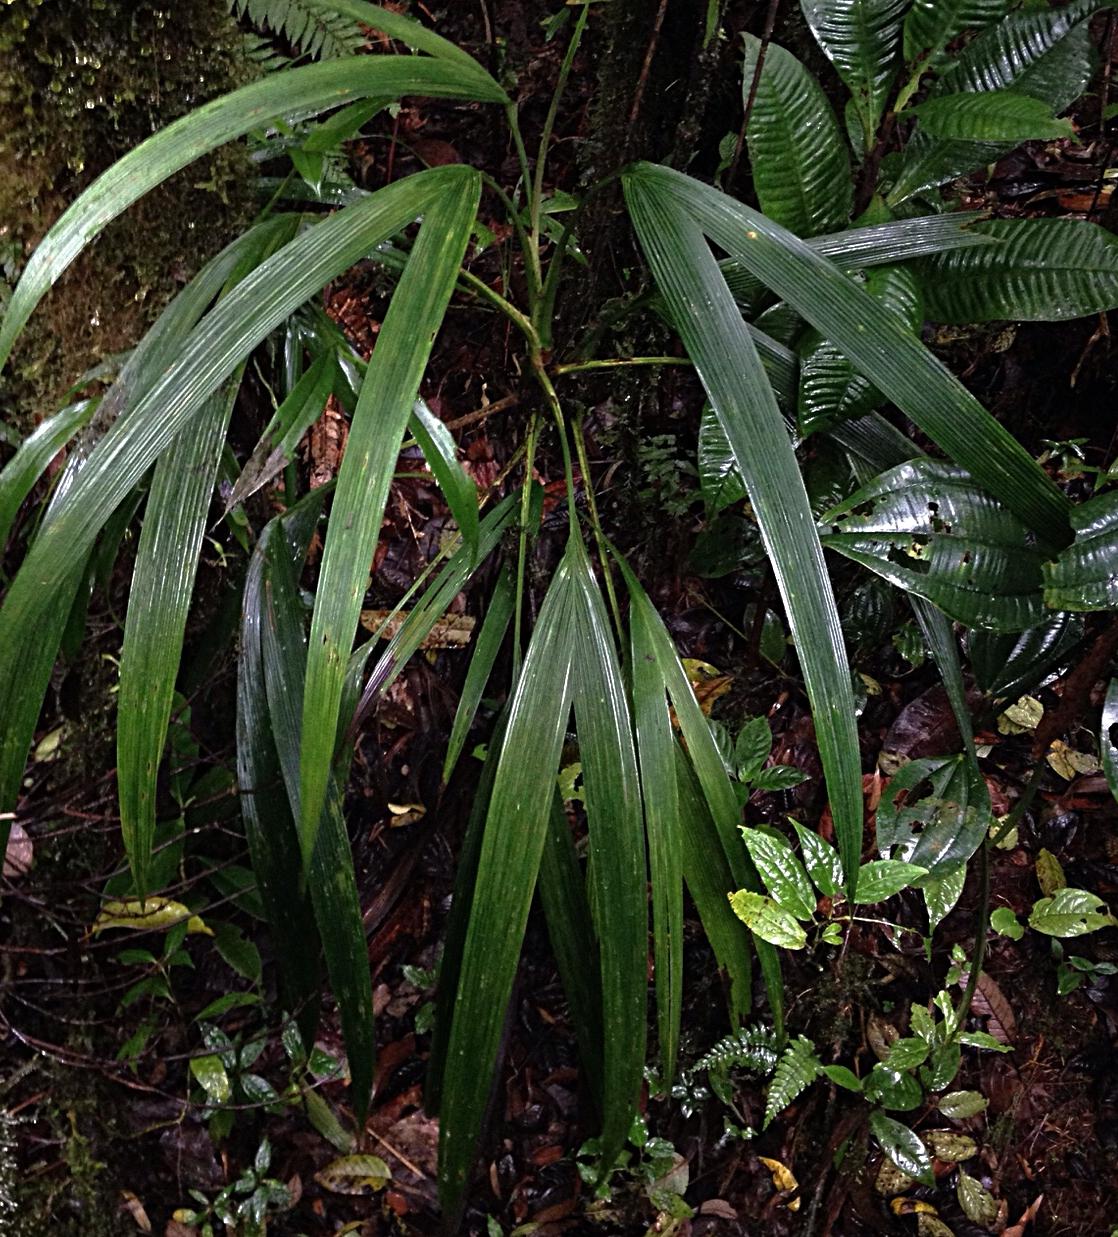 Dicranopygium cf. tatica,  Chiriquí, Panamá (Image: F. Muller)